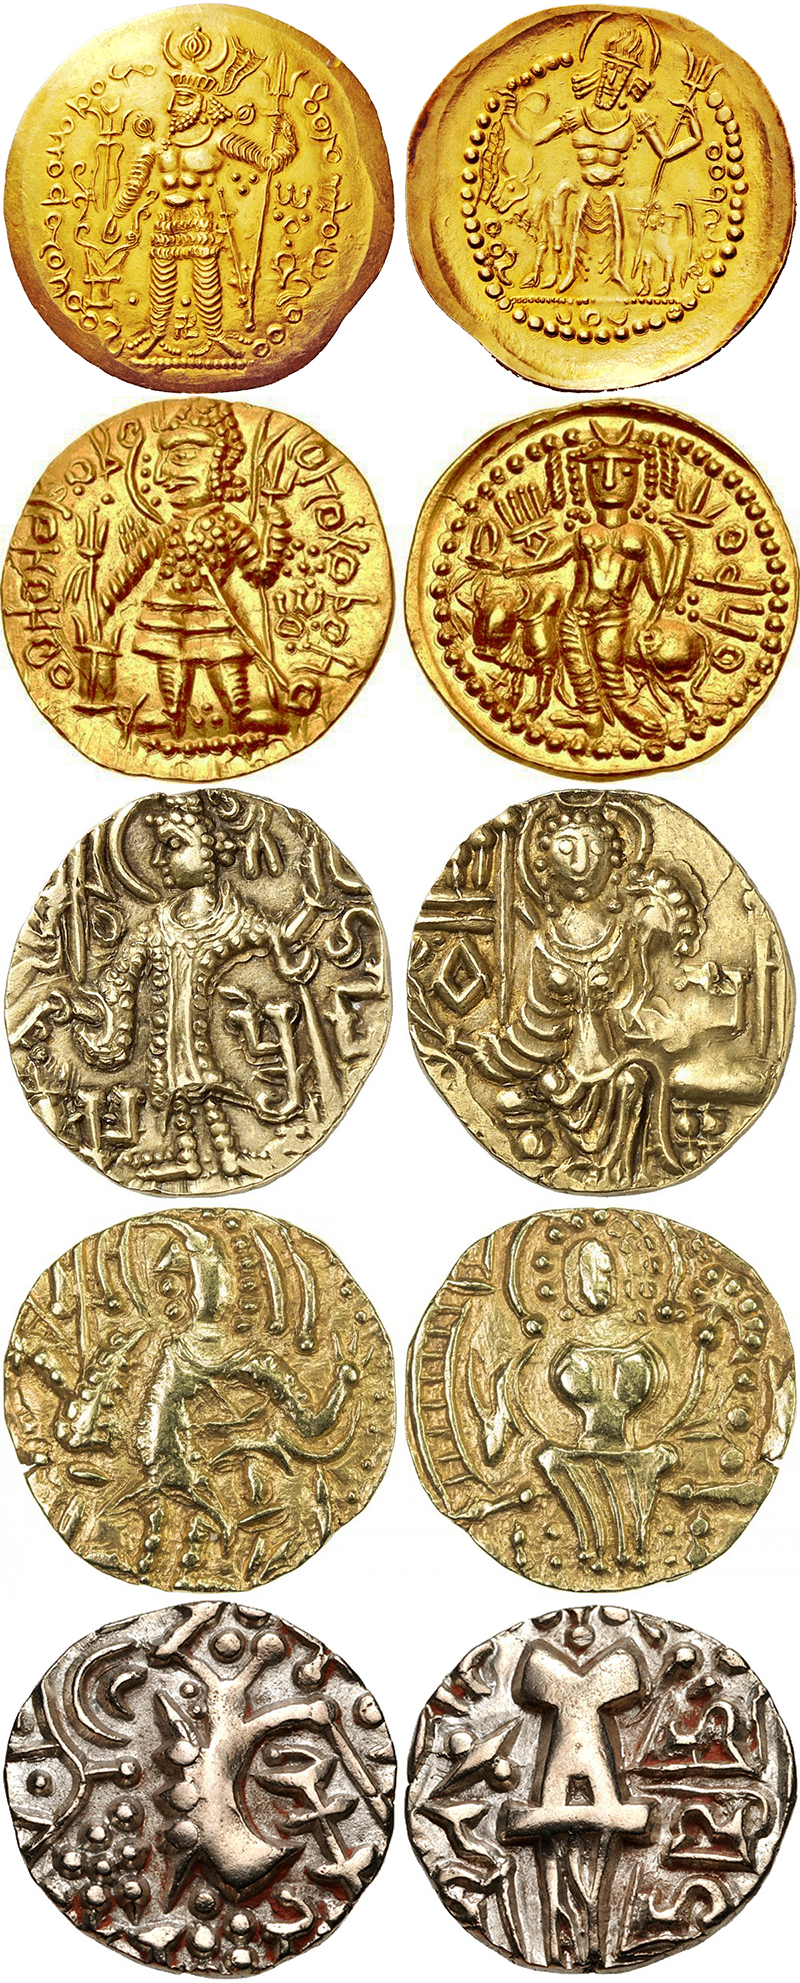 Aider à identifier la pièce de monnaie Kushano-sassanide-kidarited604c